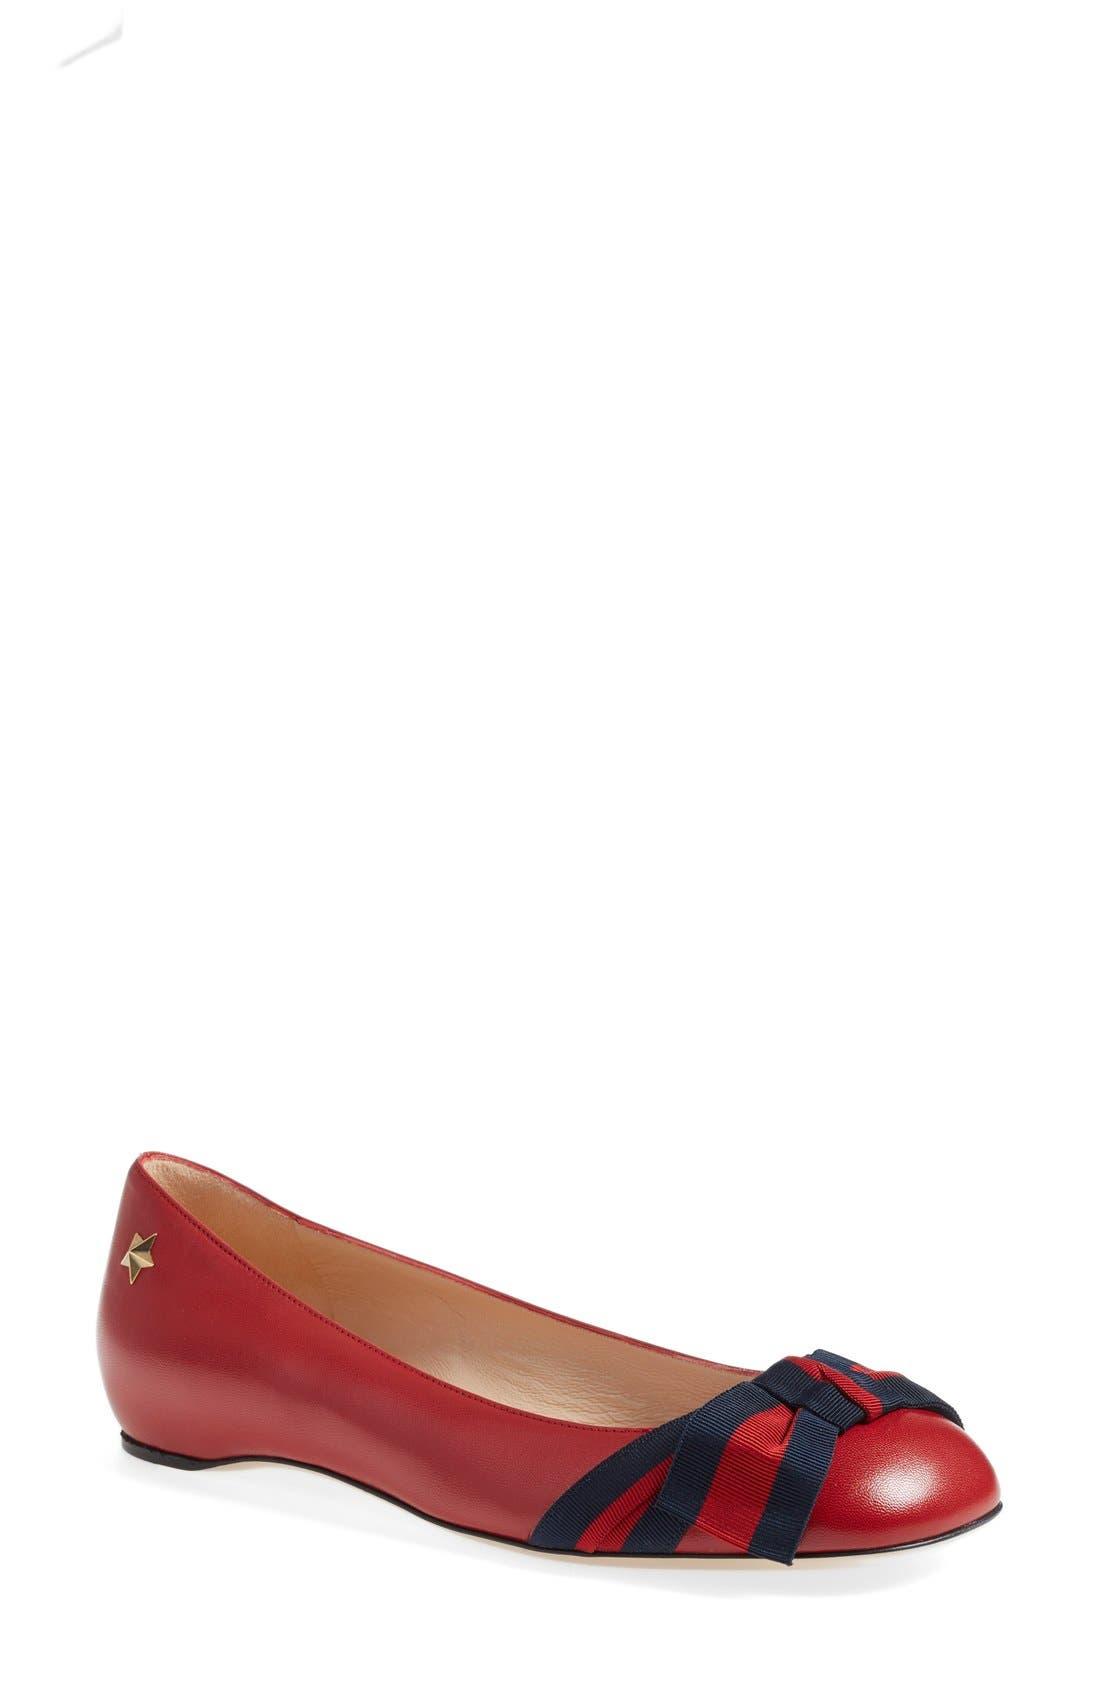 Main Image - Gucci 'Aline' Bow Ballet Flat (Women)